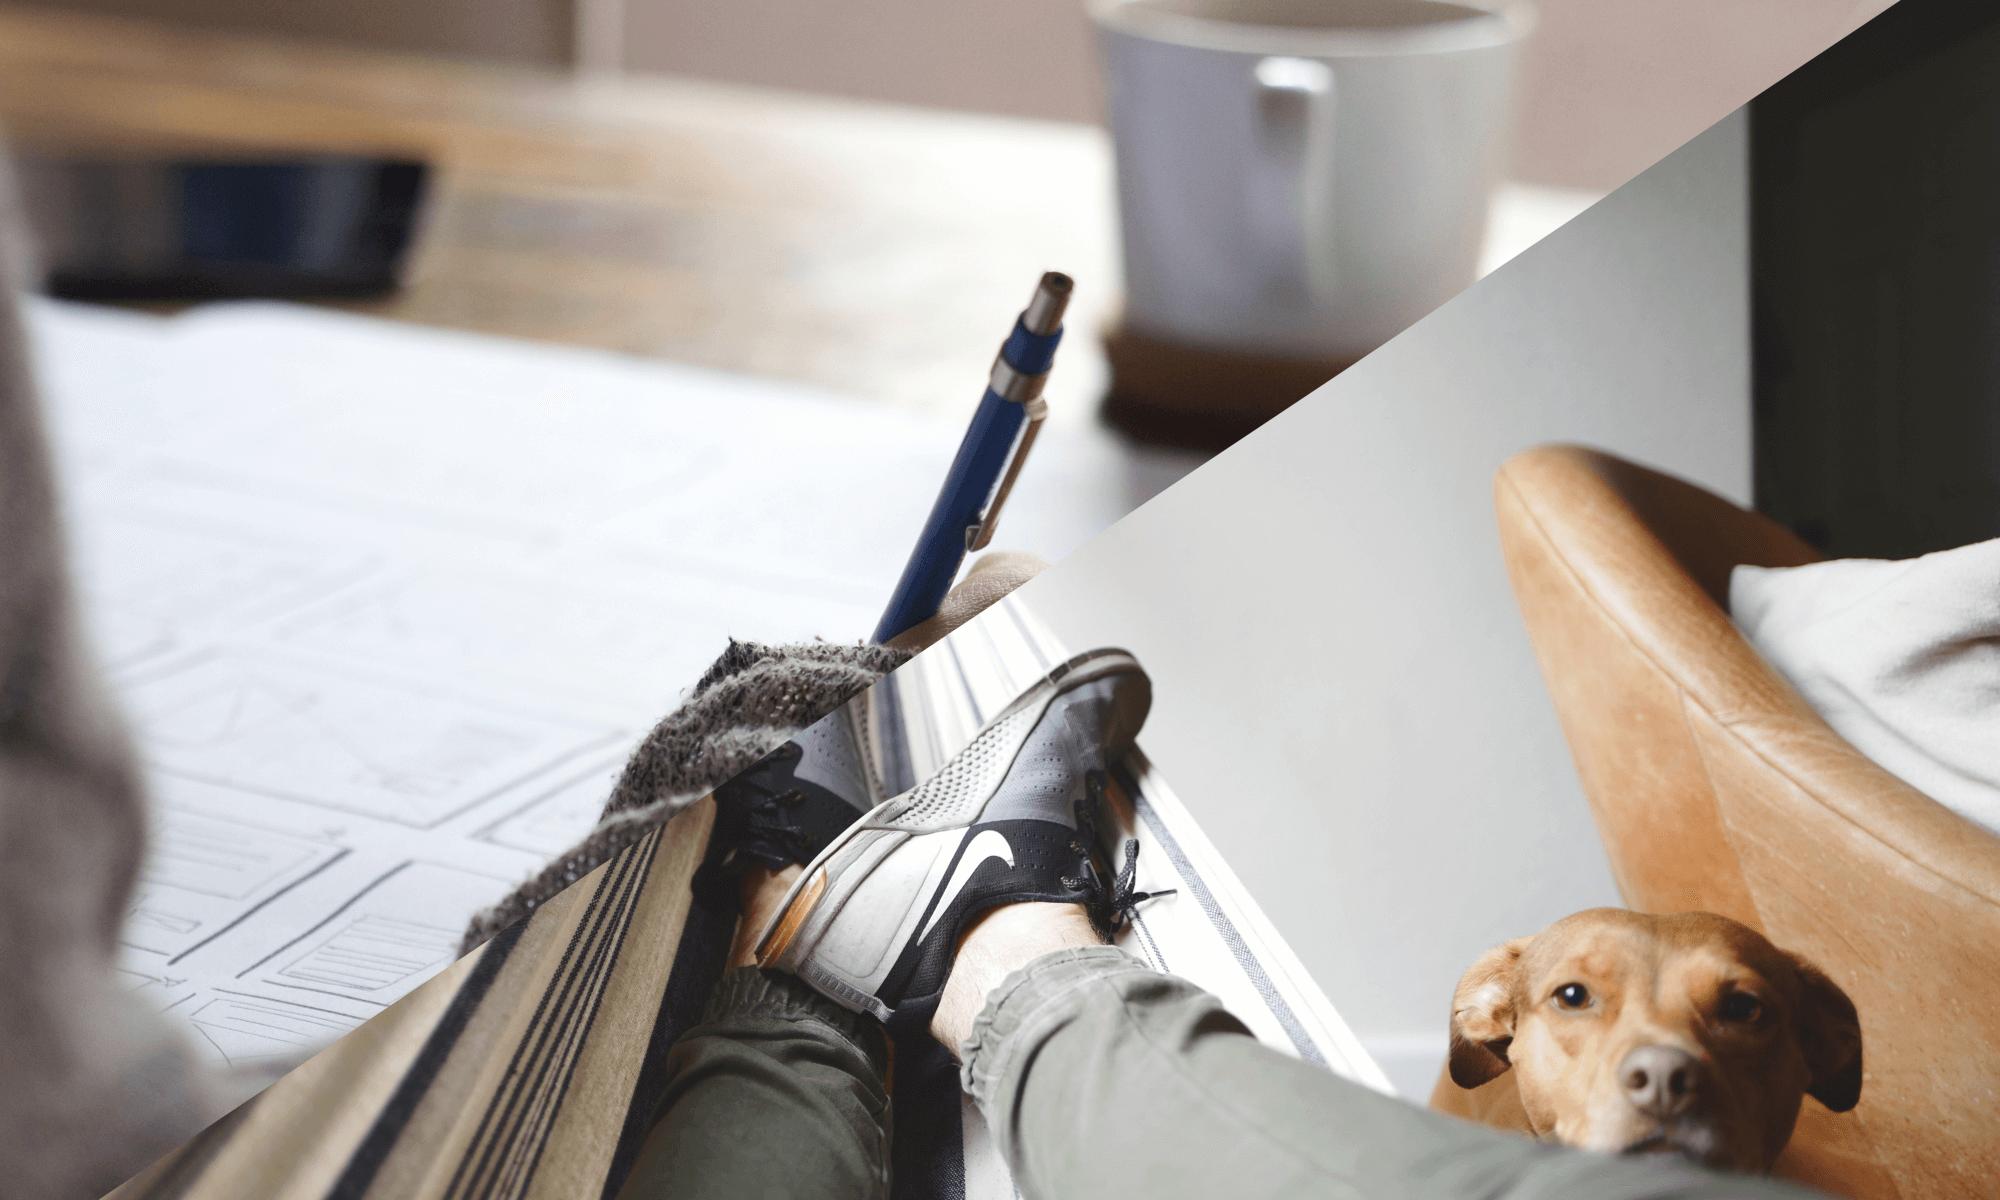 Procrastination Relaxation Studying Studieren Lernen